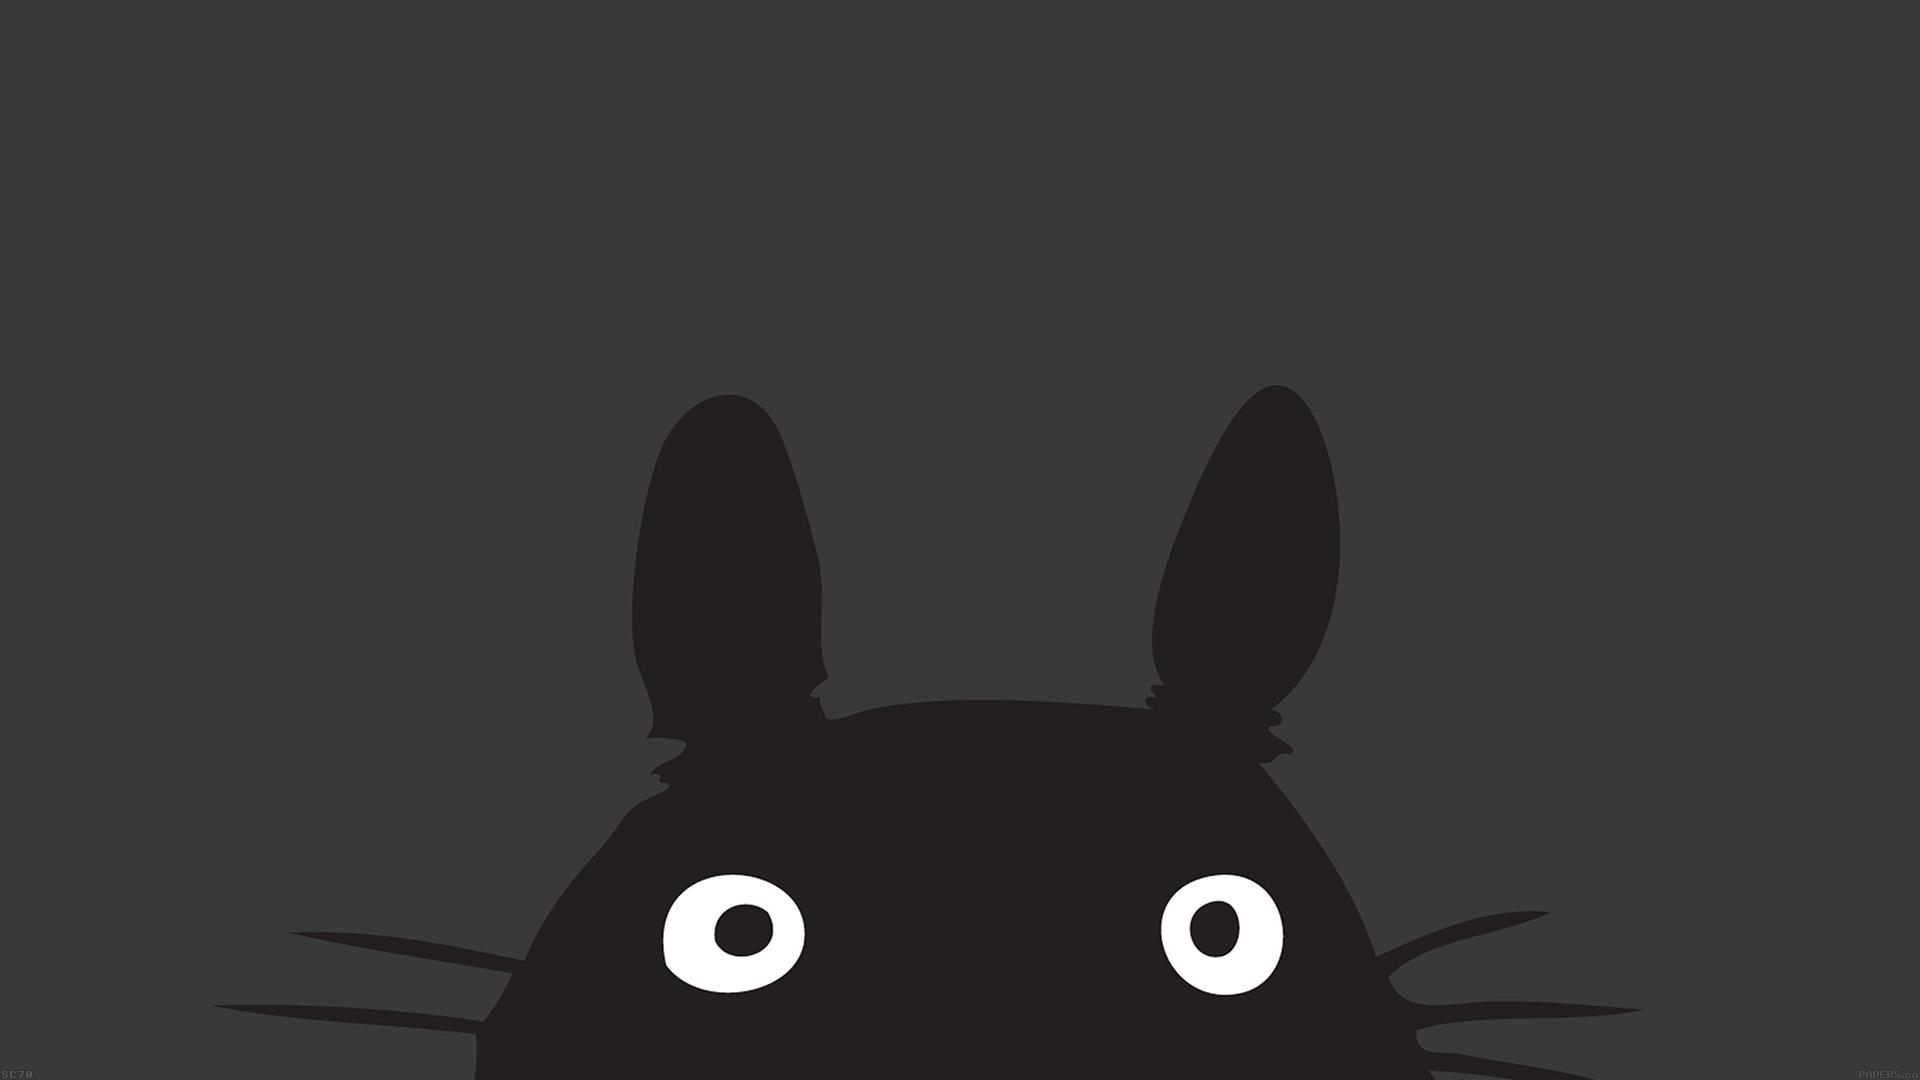 Android Lollipop Wallpaper Hd 1080p Wallpaper For Desktop Laptop Af44 Totoro Minimal Art